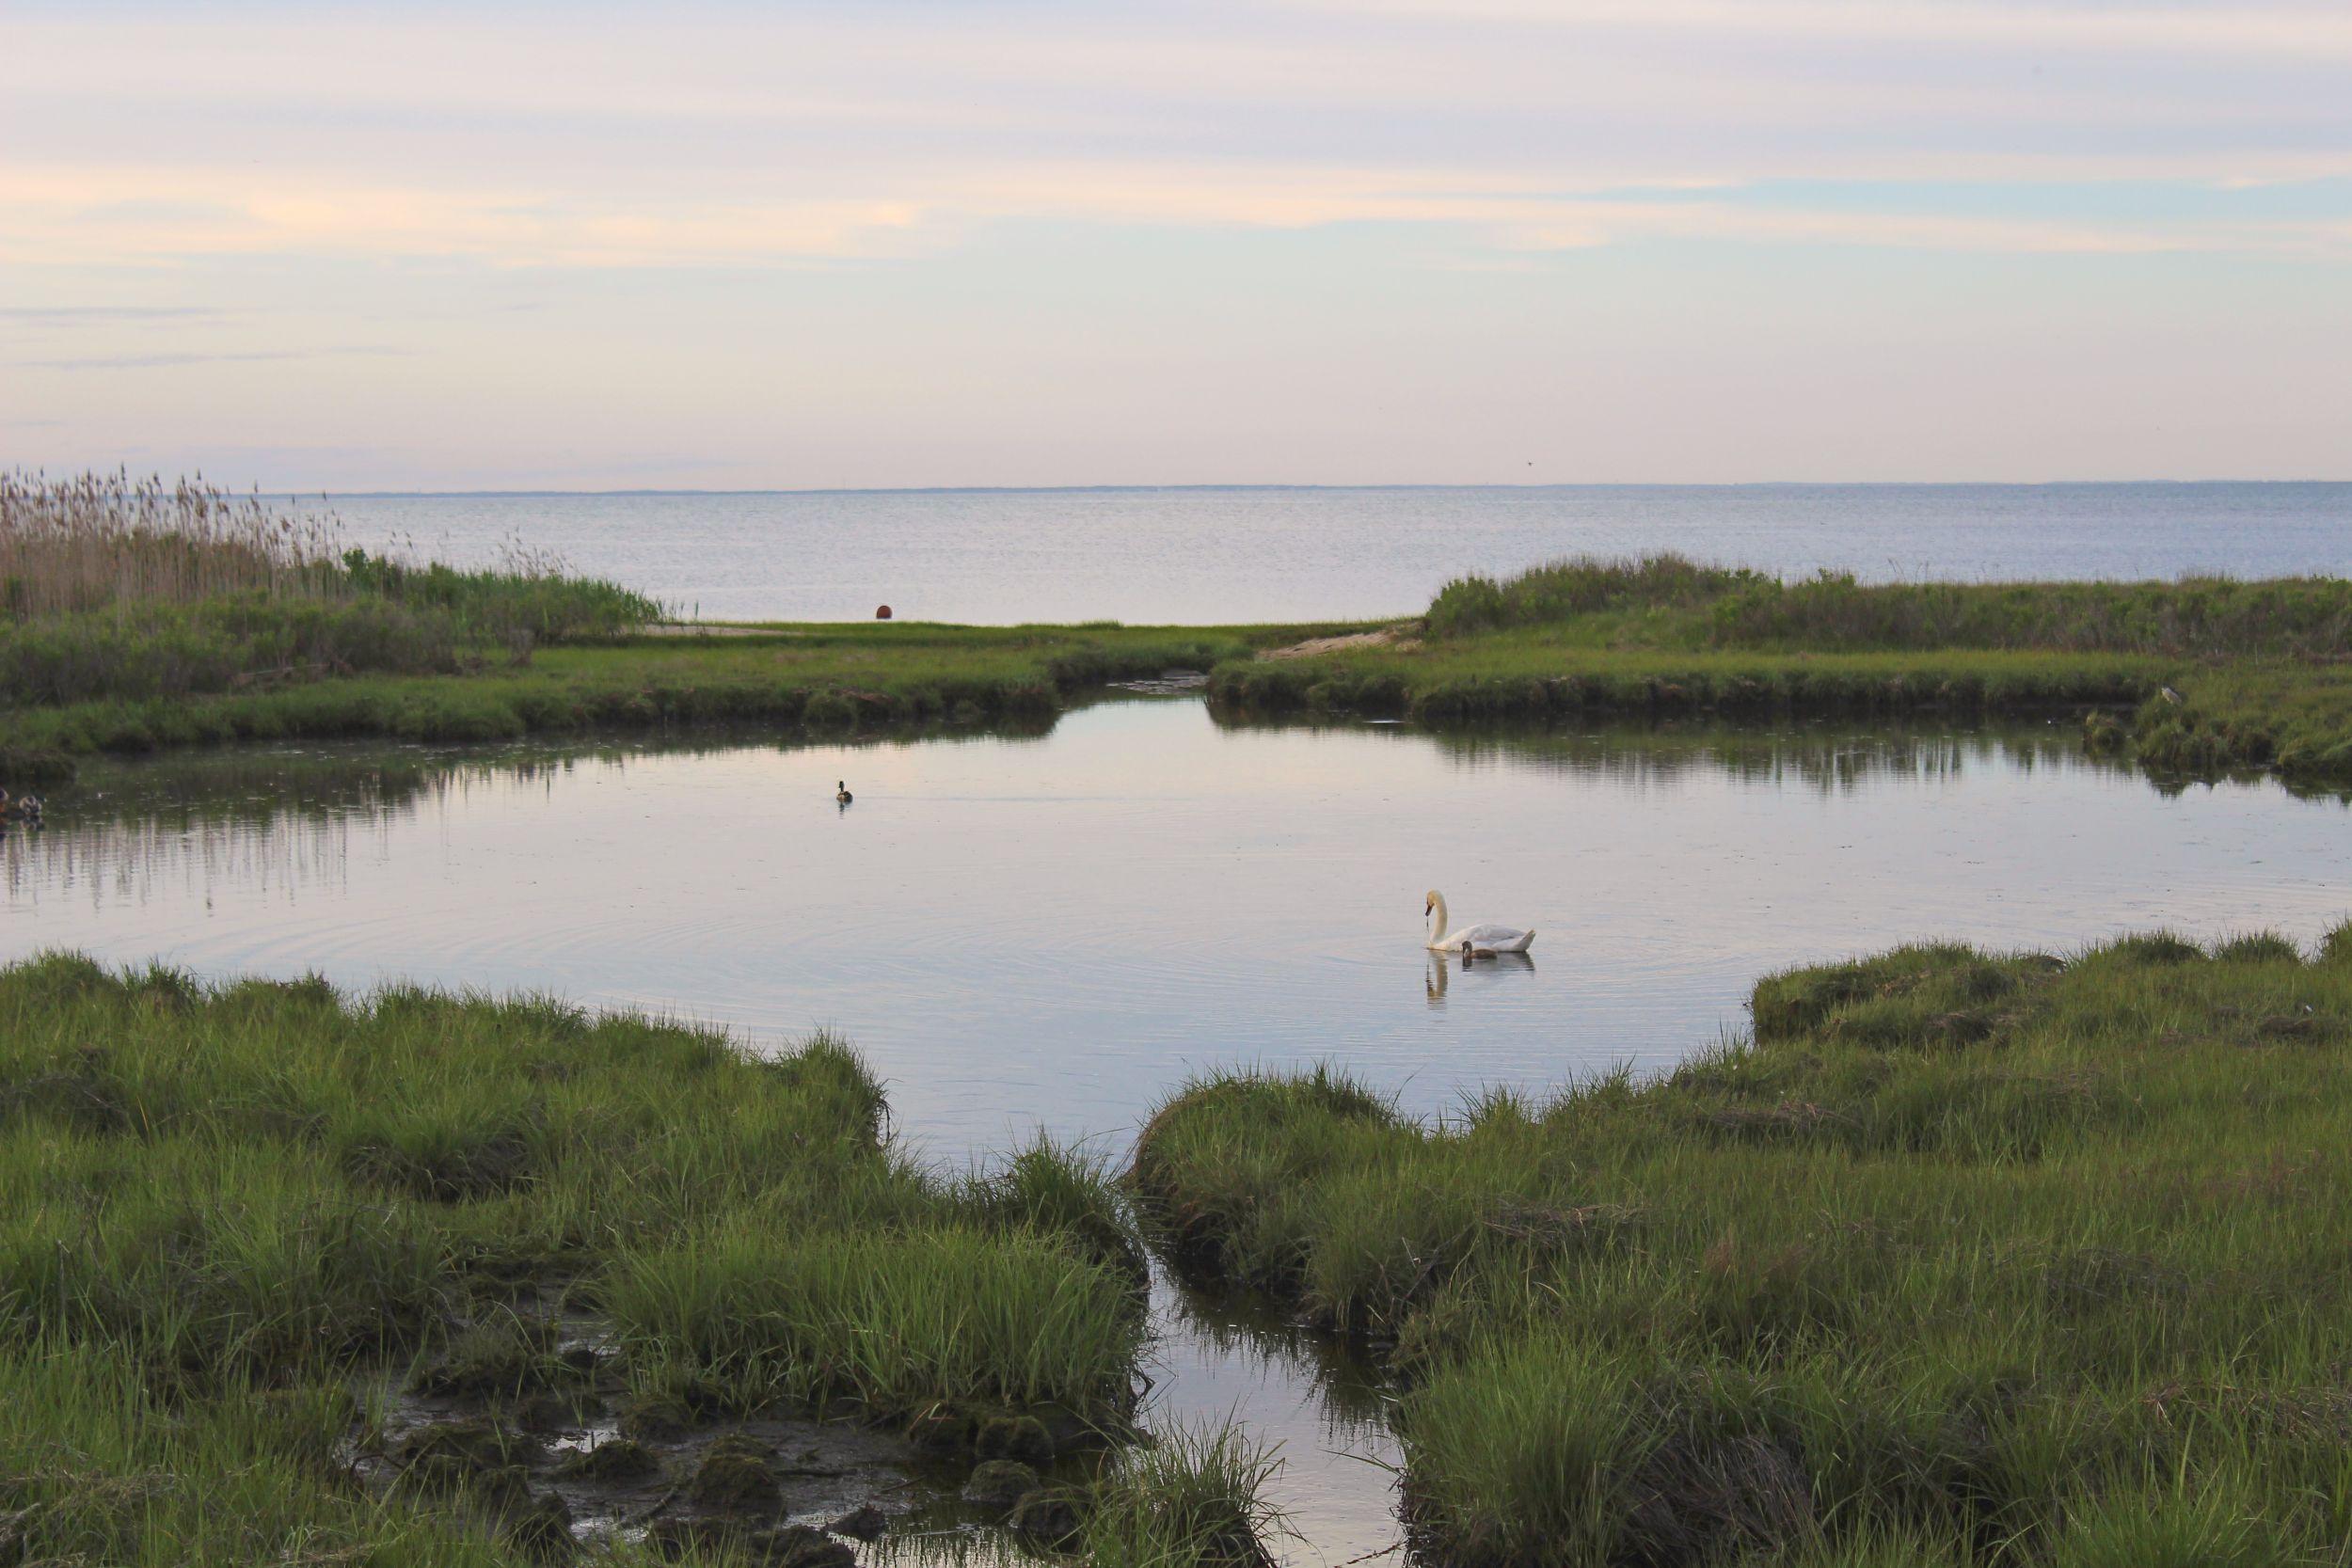 Sheriffs_Meadow_Sea_Grass_Lagoon_Marthas_Vineyard_Swan_Sunset.jpg